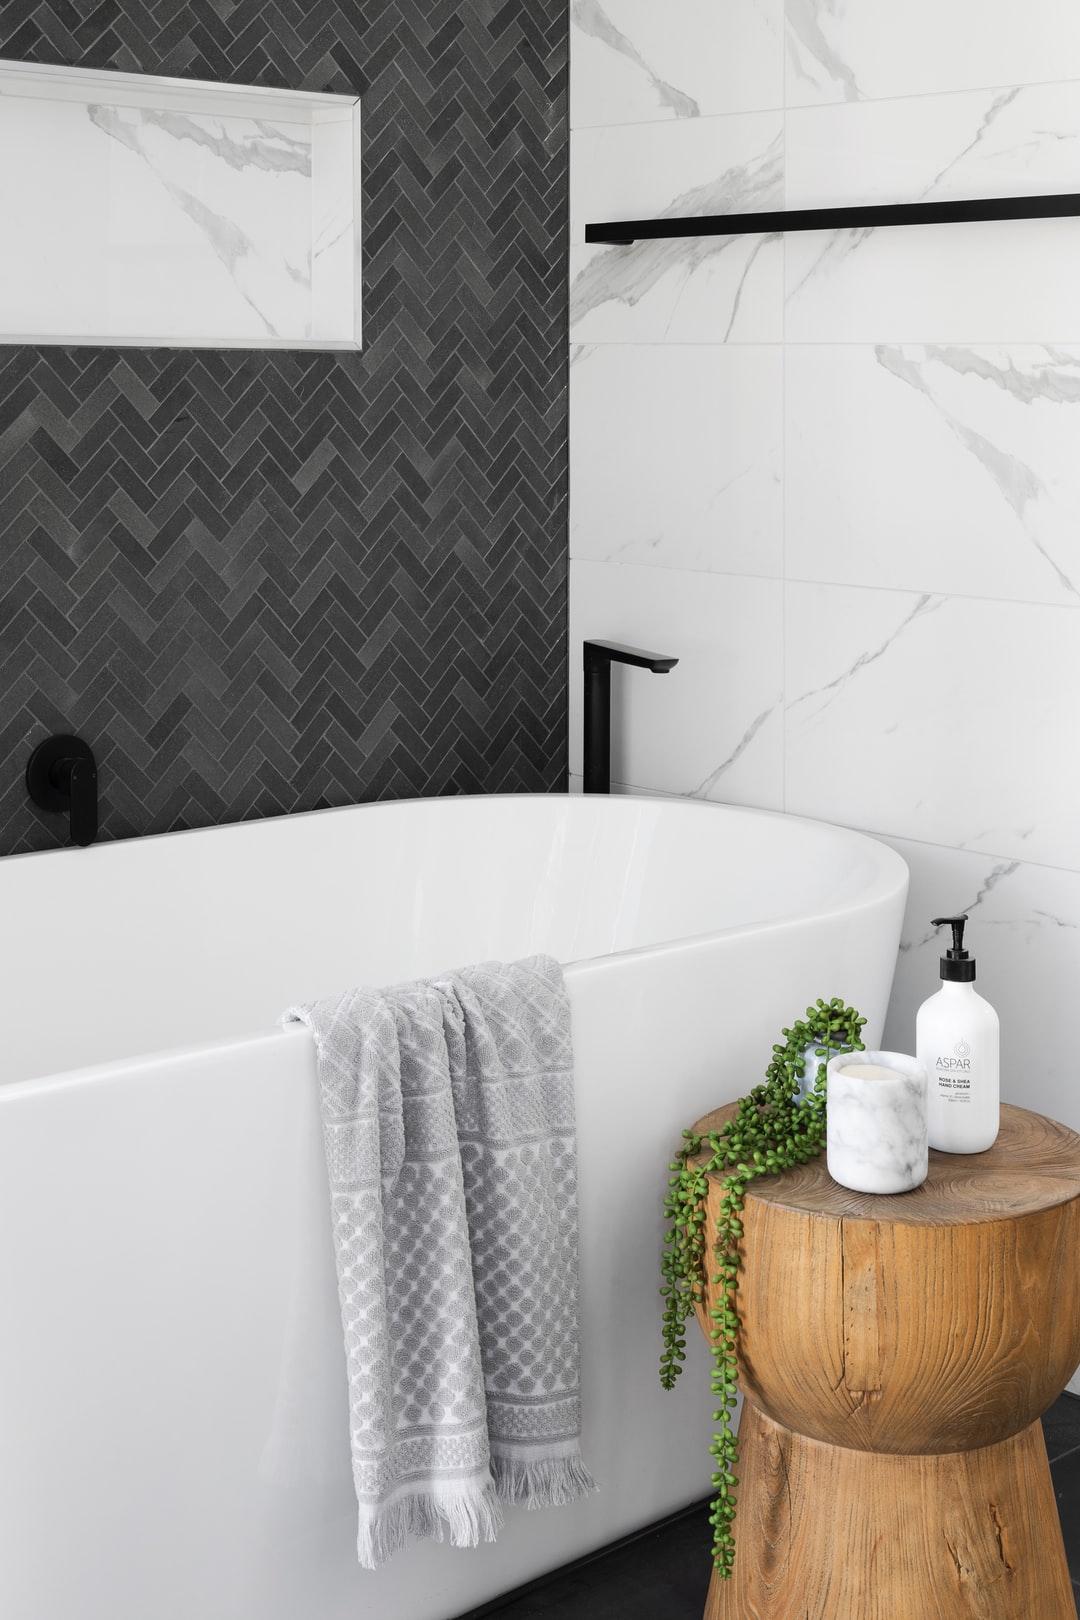 spokane bathtub replacement company